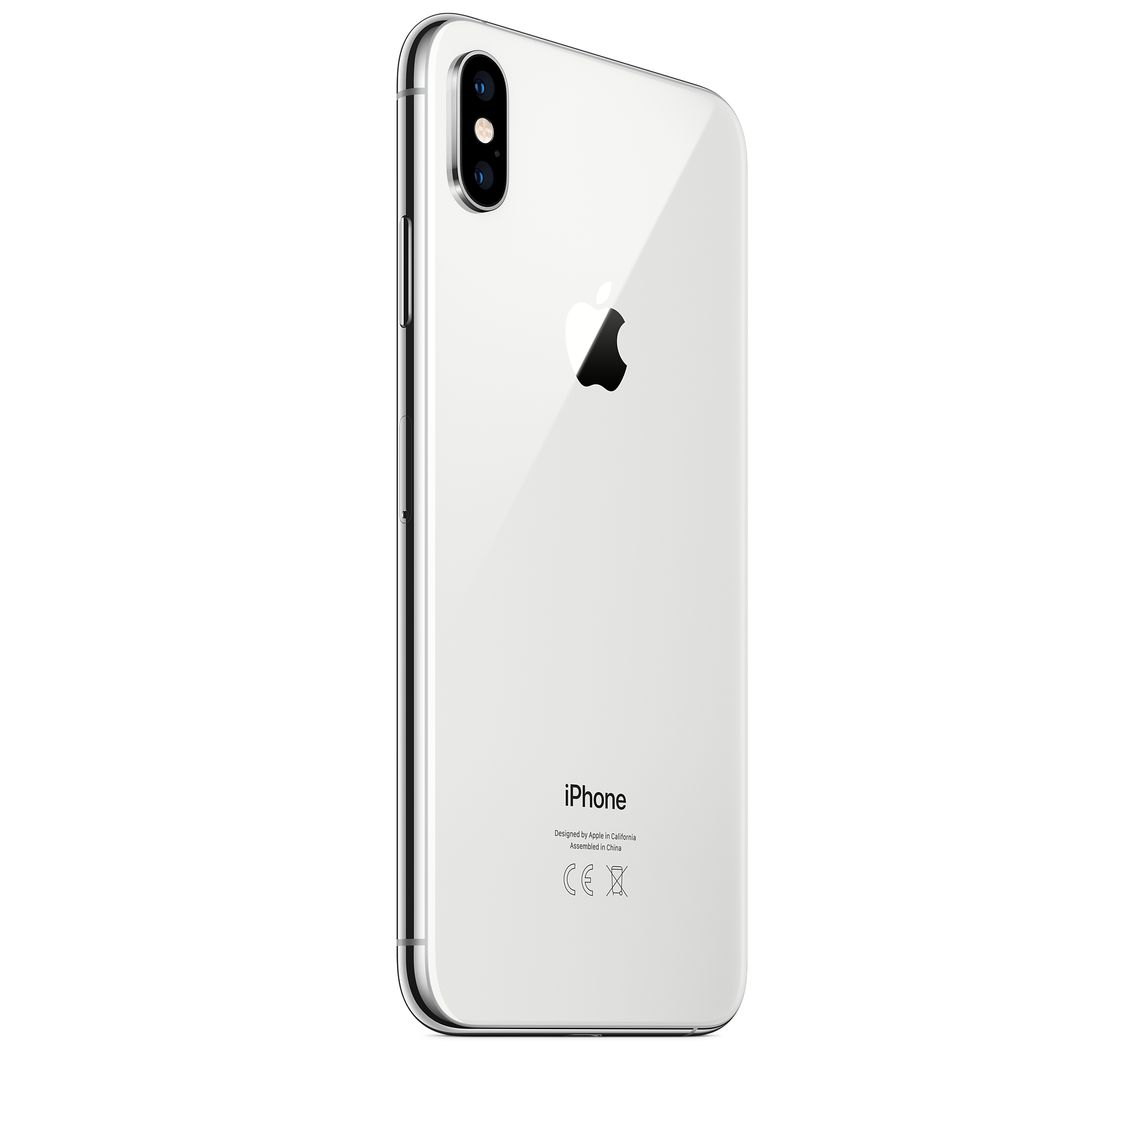 Xs max iphone iPhone XS